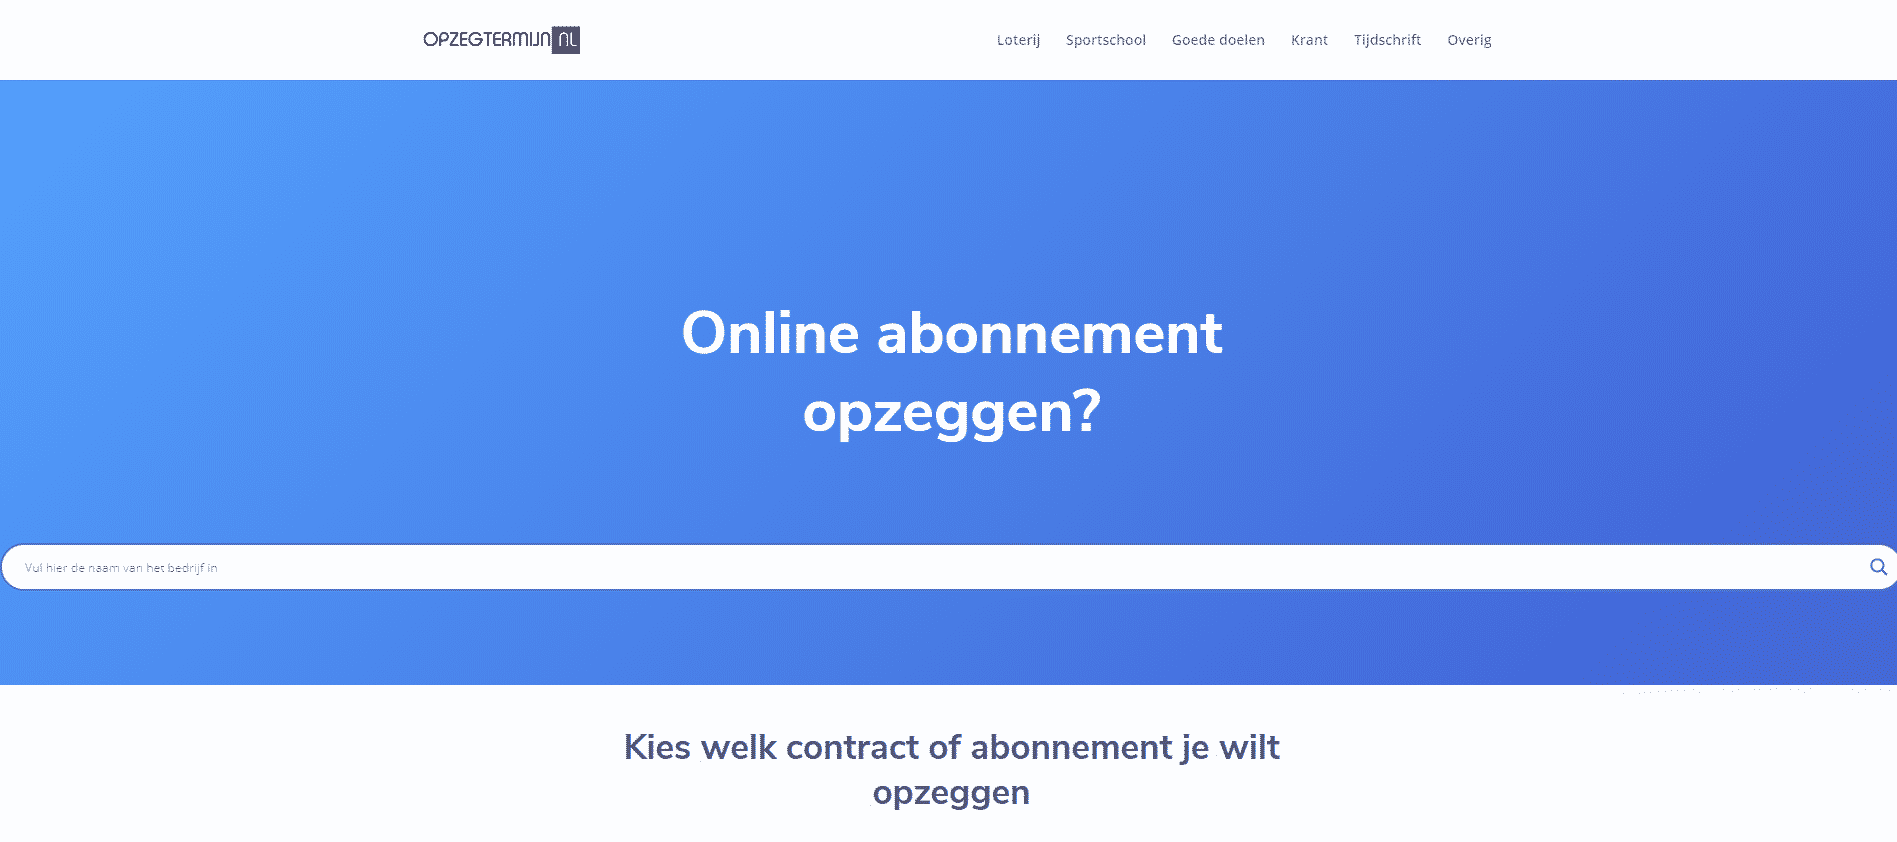 Opzegtermijn.nl